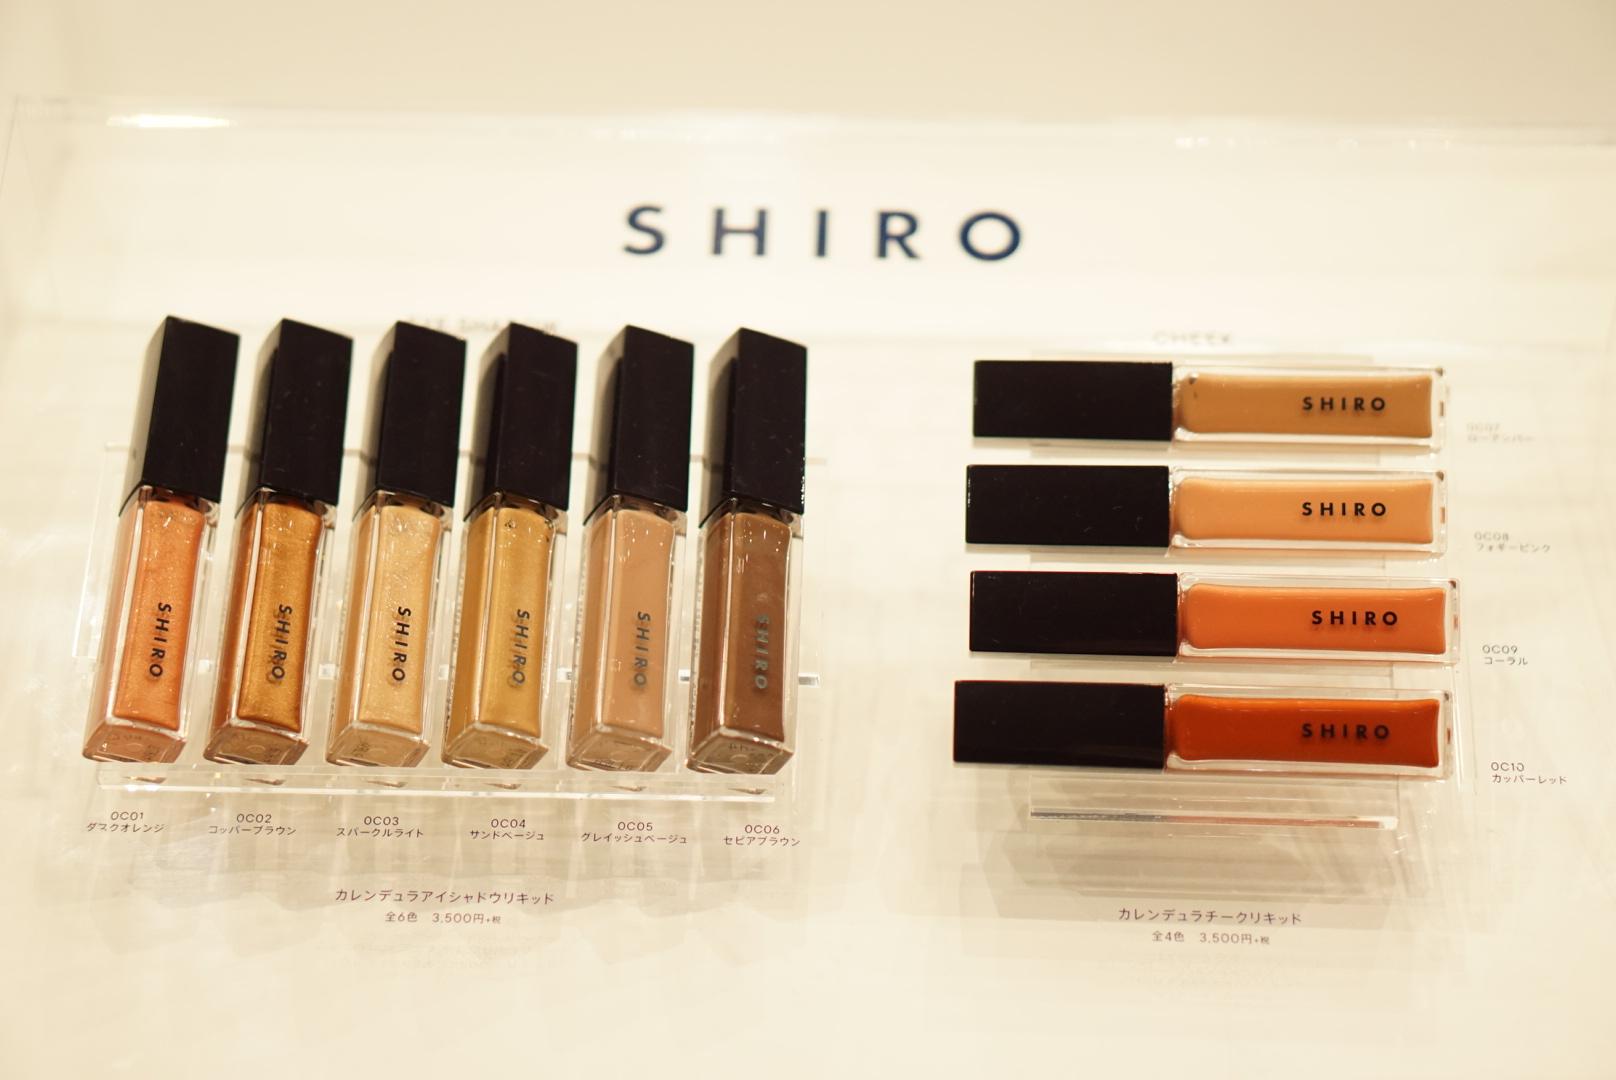 SHIRO シロ cosmetics makeup natural コスメ London Newyork_カレンデュラ